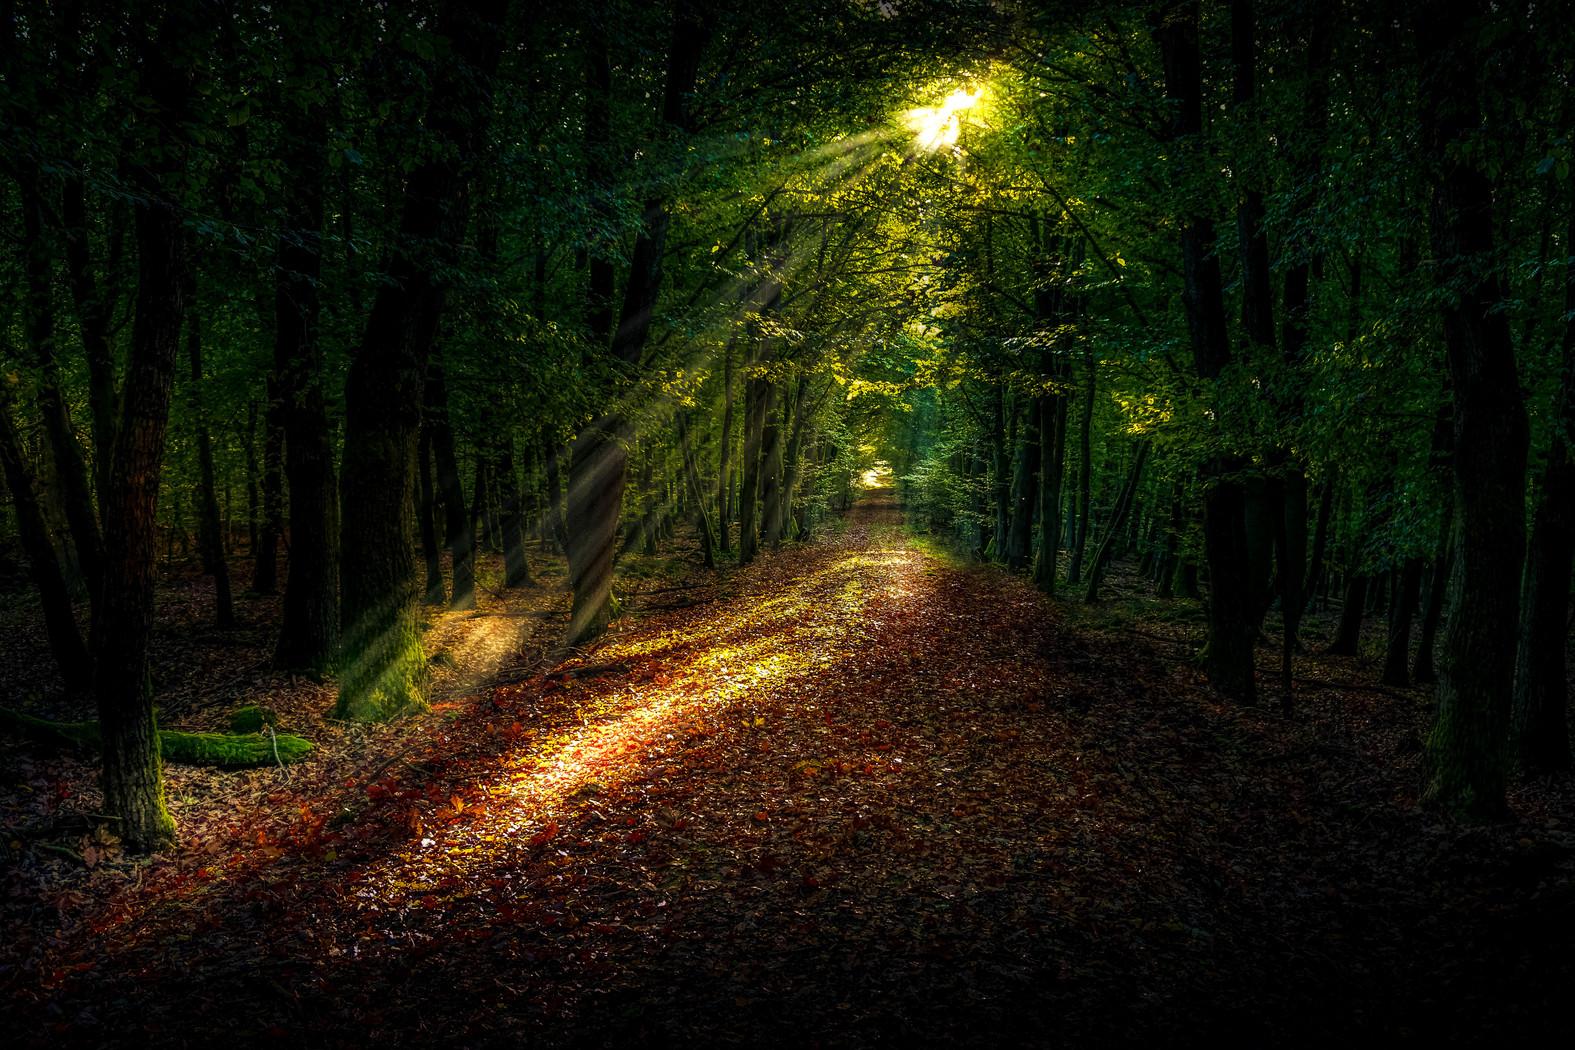 BOSQUE landscape-tree-nature-forest-path-grass-1417529-pxhere.com